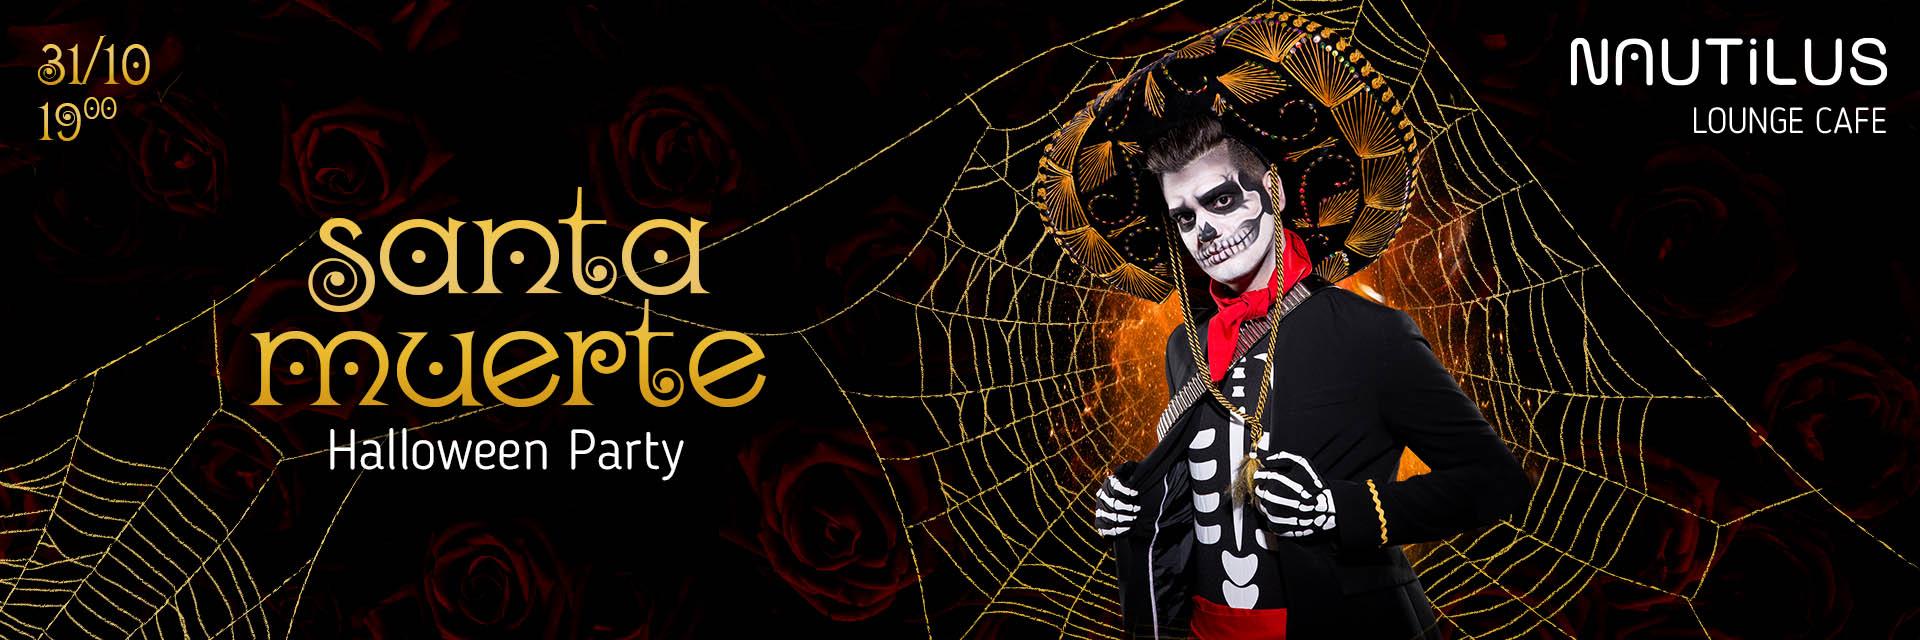 Halloween Party 2020 в NAUTILUS Lounge Cafe в RESORT & SPA HOTEL NEMO, фото № 1